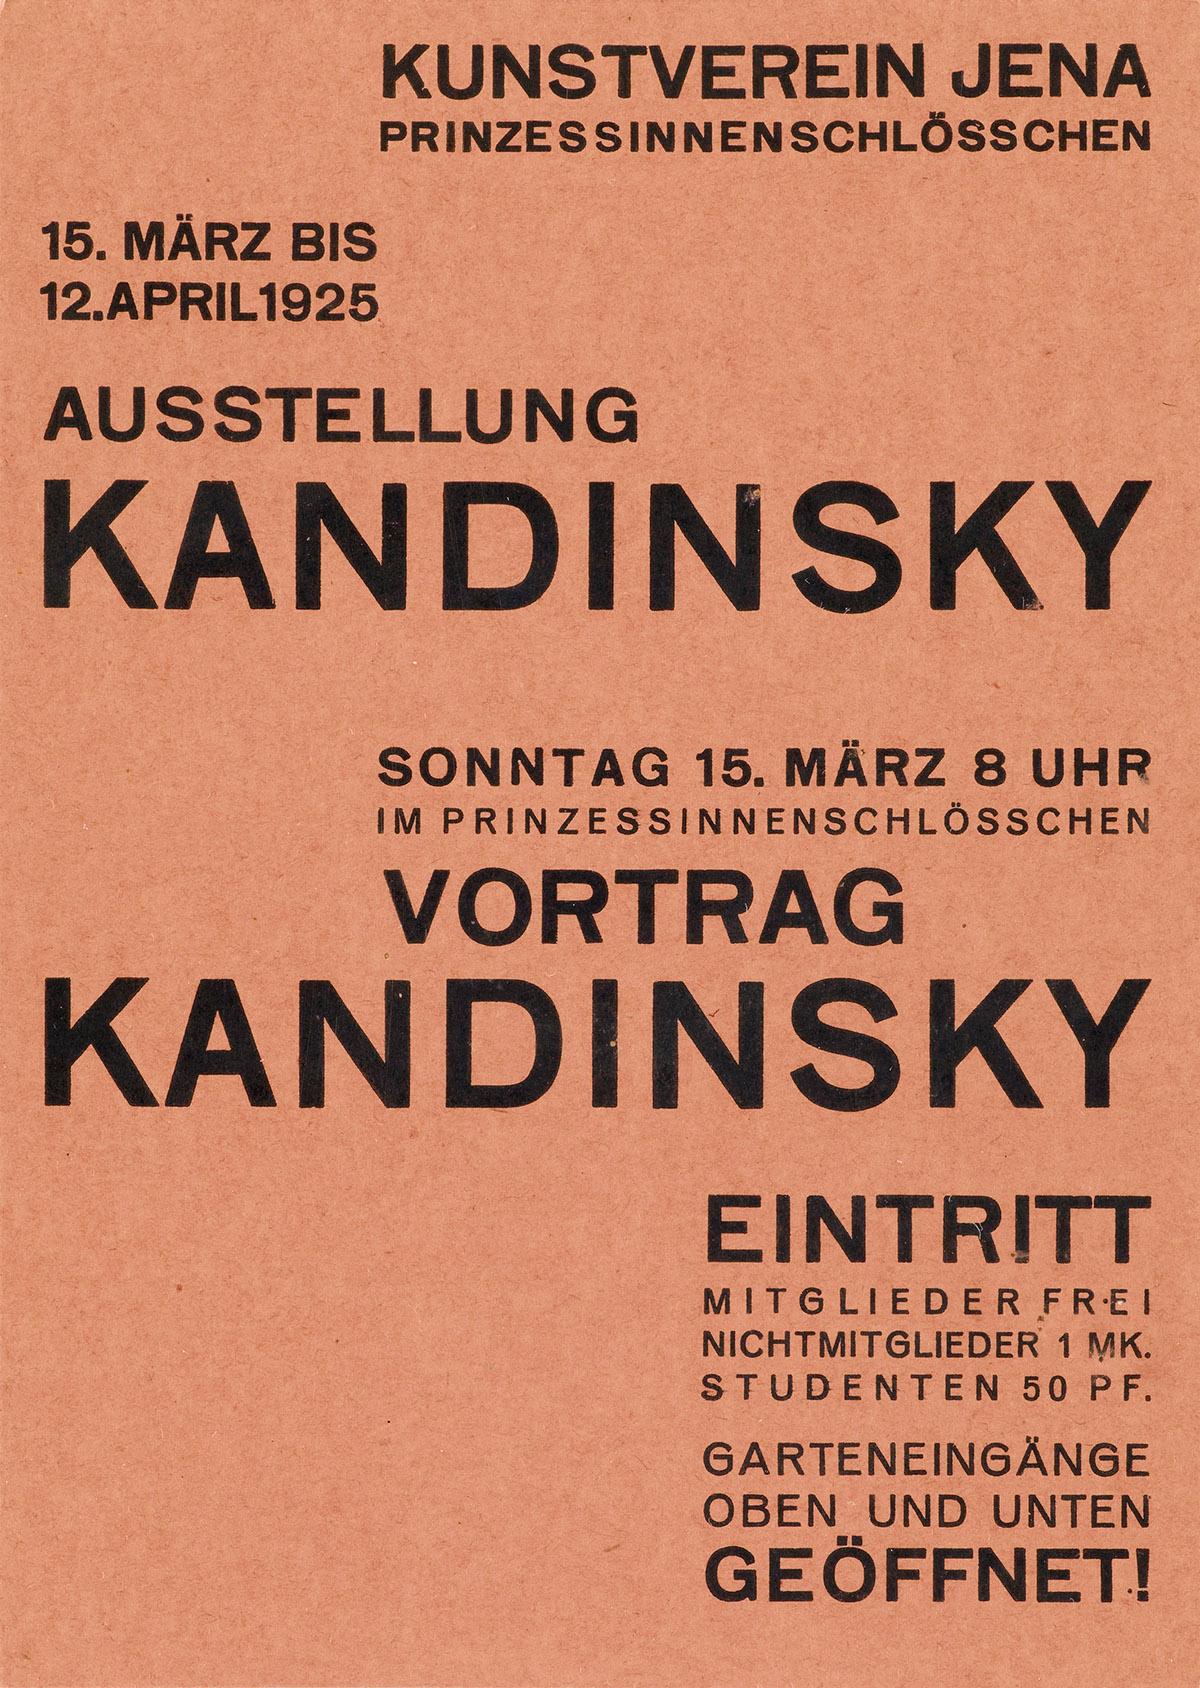 WALTER DEXEL (1890-1973). AUSSTELLUNG KANDINSKY. Invitation card. 1925. 5x4 inches, 14x10 cm.